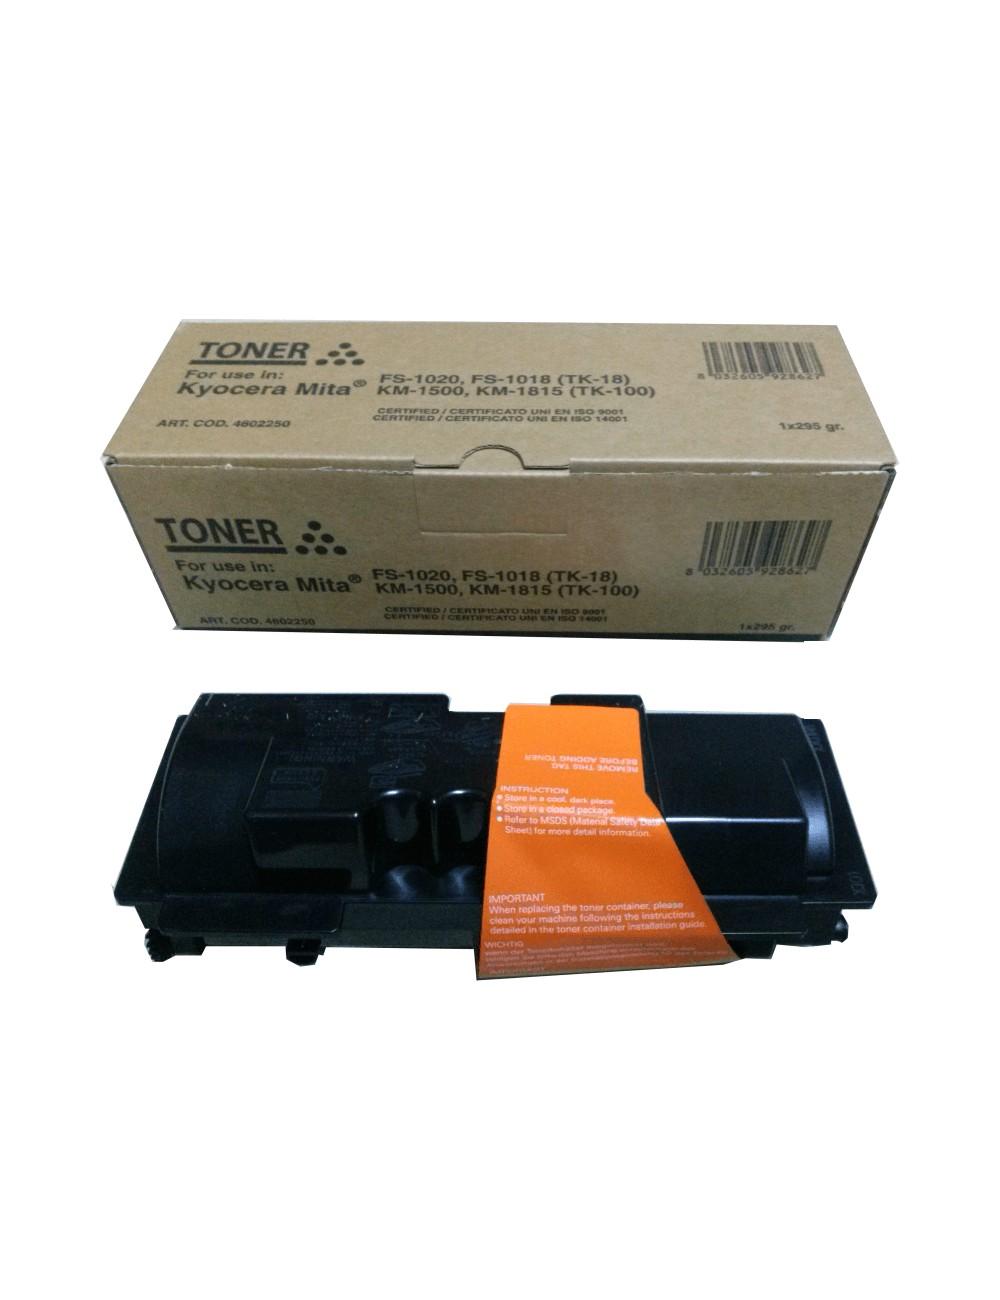 Kyocera KM 1500-ΚΜ 1815-FS 1118-1020-1018-2020 MFP Universal Συμβατό Τόνερ